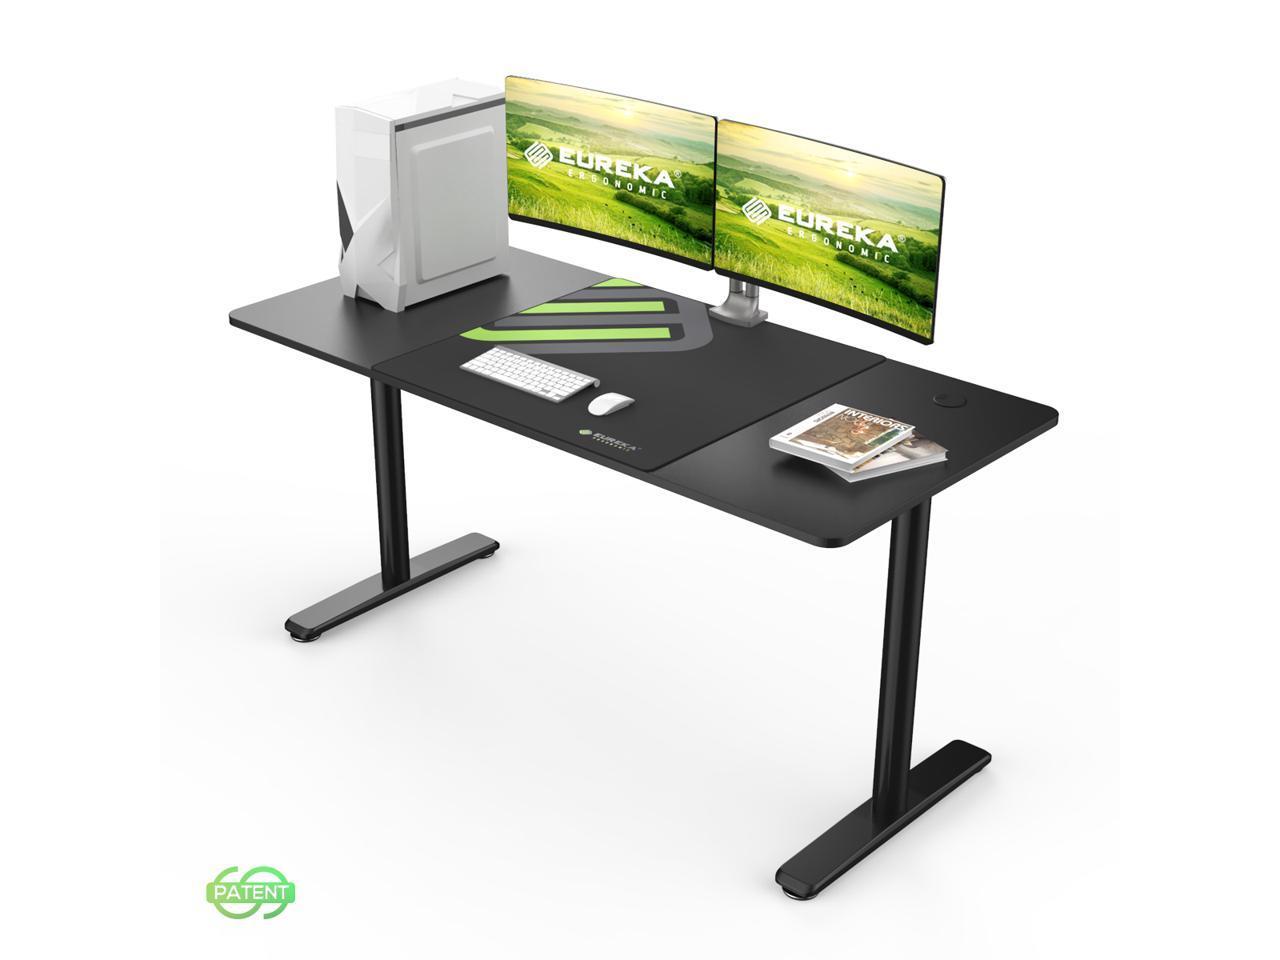 Eureka Ergonomic 60 Inches Large Workstation Simple Computer Desk Home Office Table Black Newegg Com